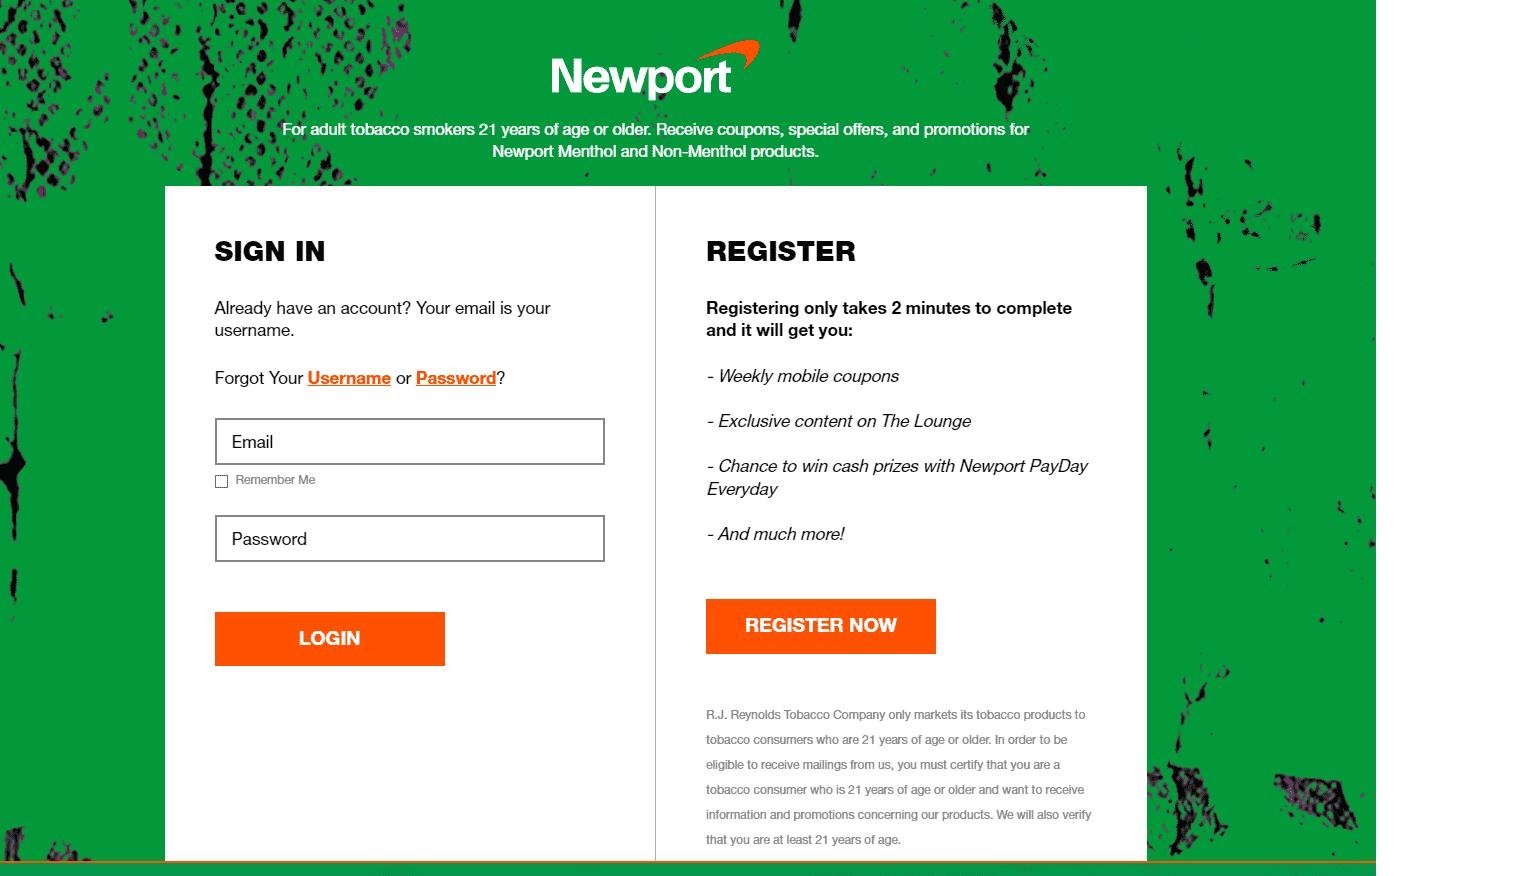 Newport Cigarettes reviews and complaints